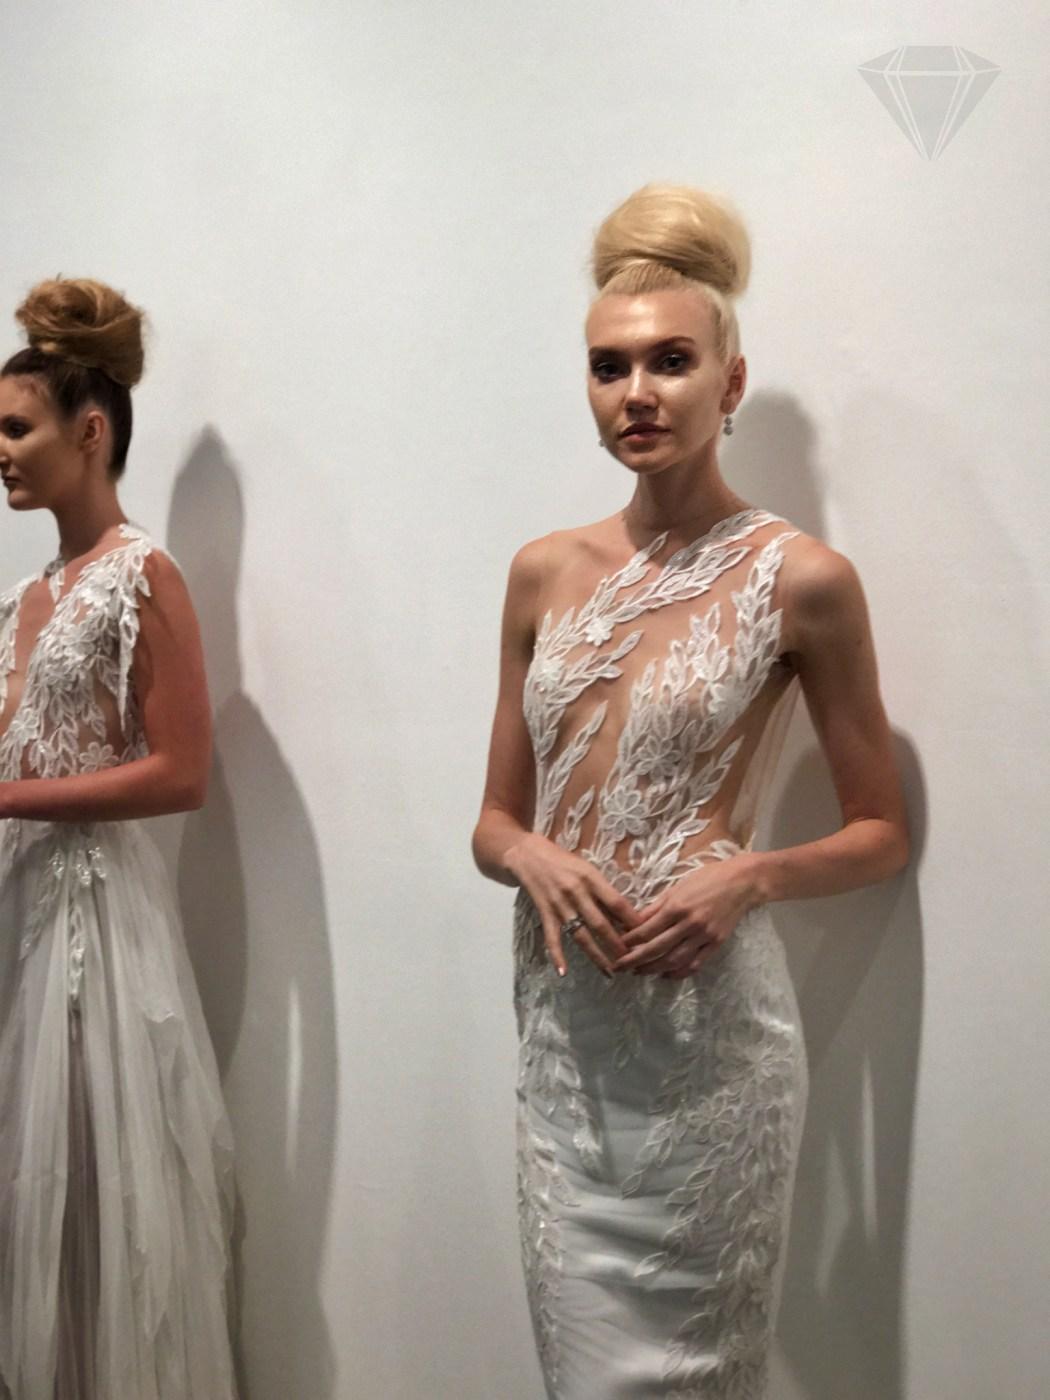 Michael Costello Spring Summer 2018 Womenswear at New York Fashion Week